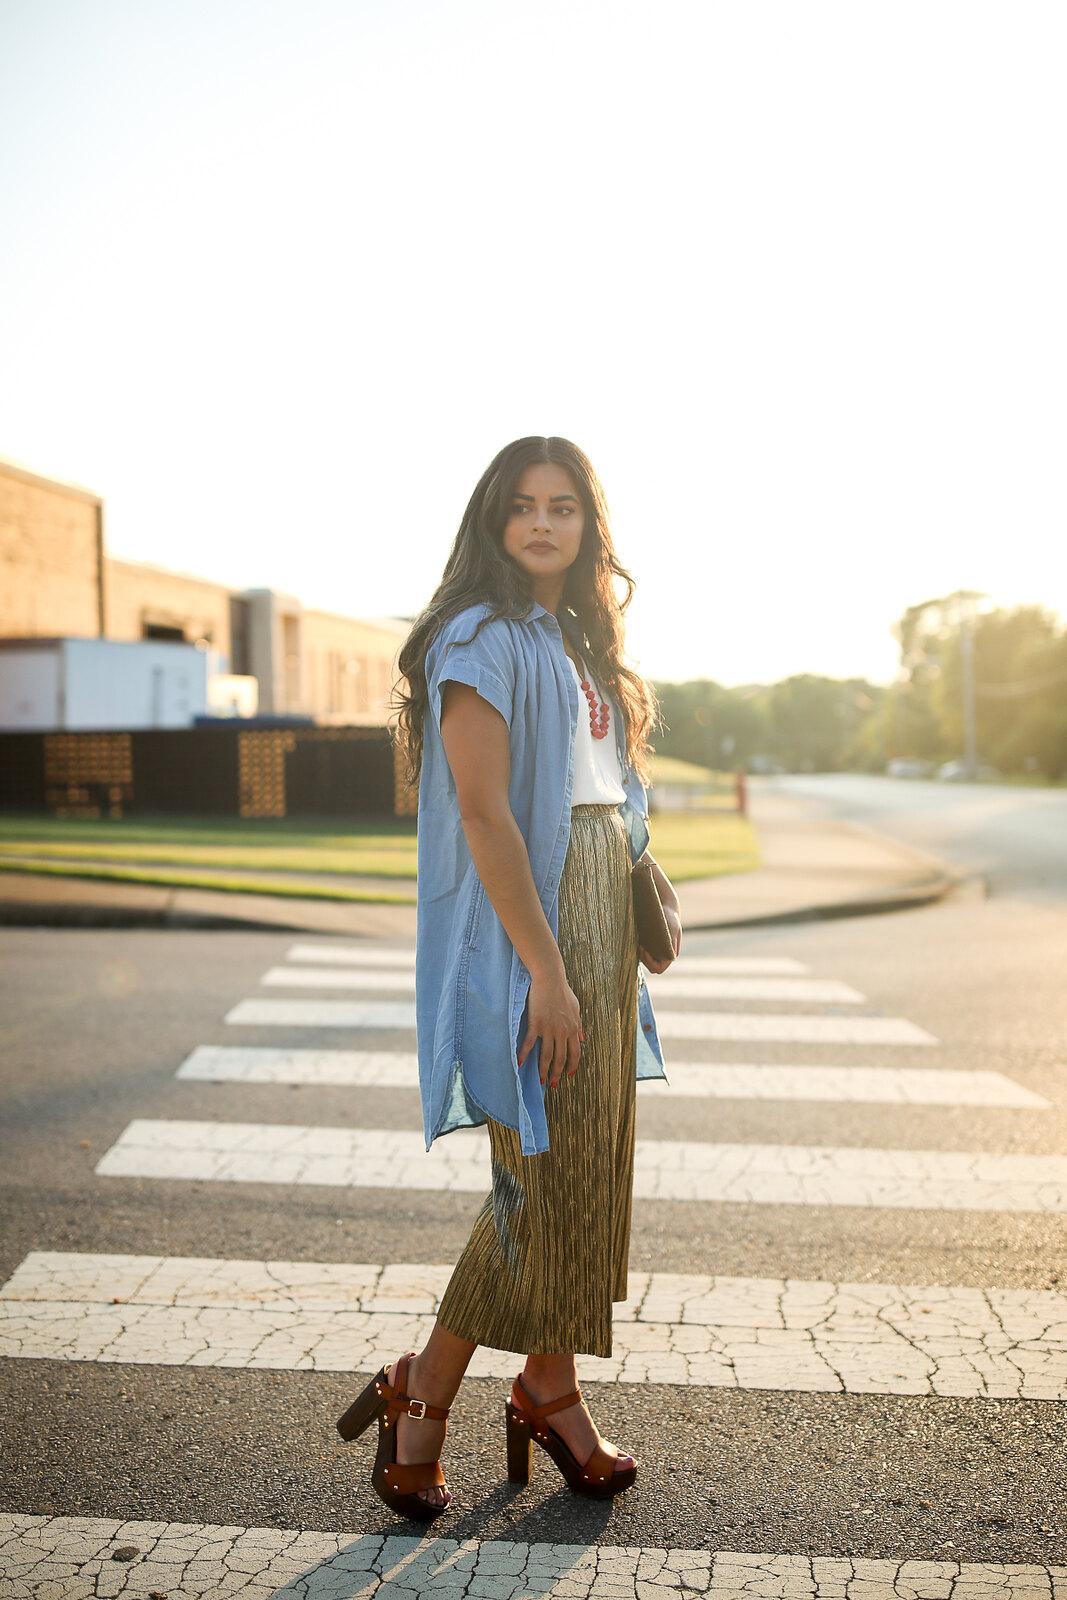 Priya the Blog, Nashville fashion blog, Nashville fashion blogger, Nashville style blog, Nashville style blogger, metallic pants, gold pants, how to wear metallic pants, Topshop pleated gold trousers for Summer, Summer outfit with metallic pants, casual outfit with metallic pants, Madewell chambray dress, Target clog sandals